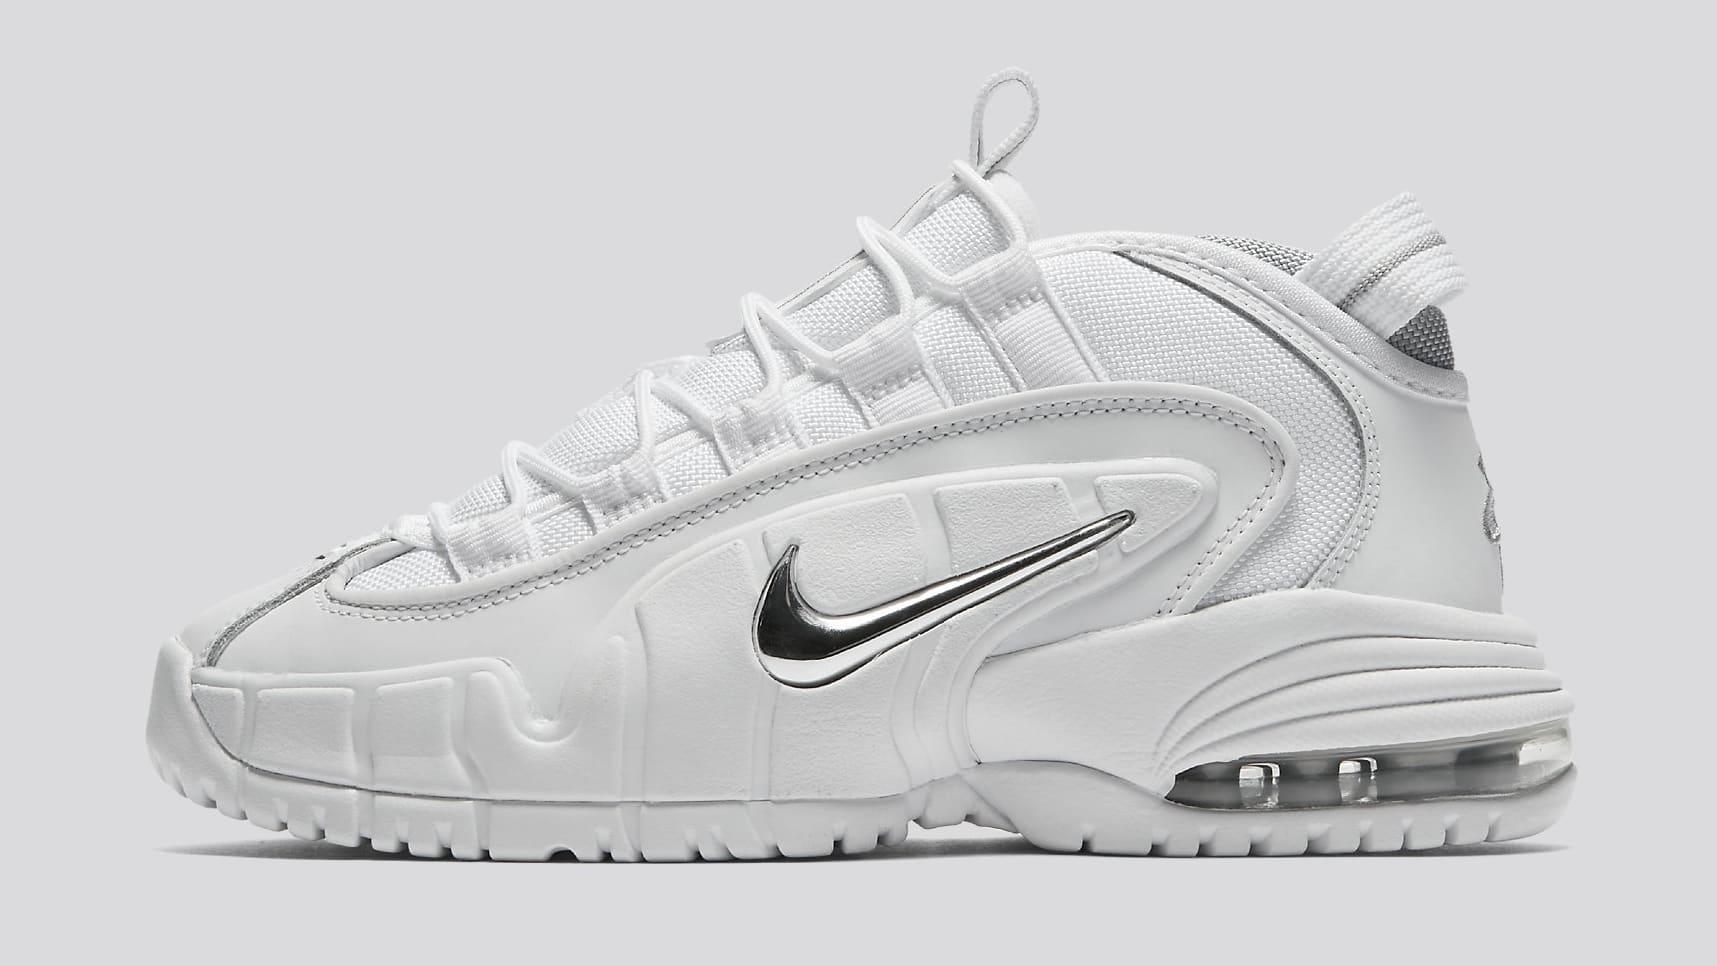 nike-air-max-penny-1-white-metallic